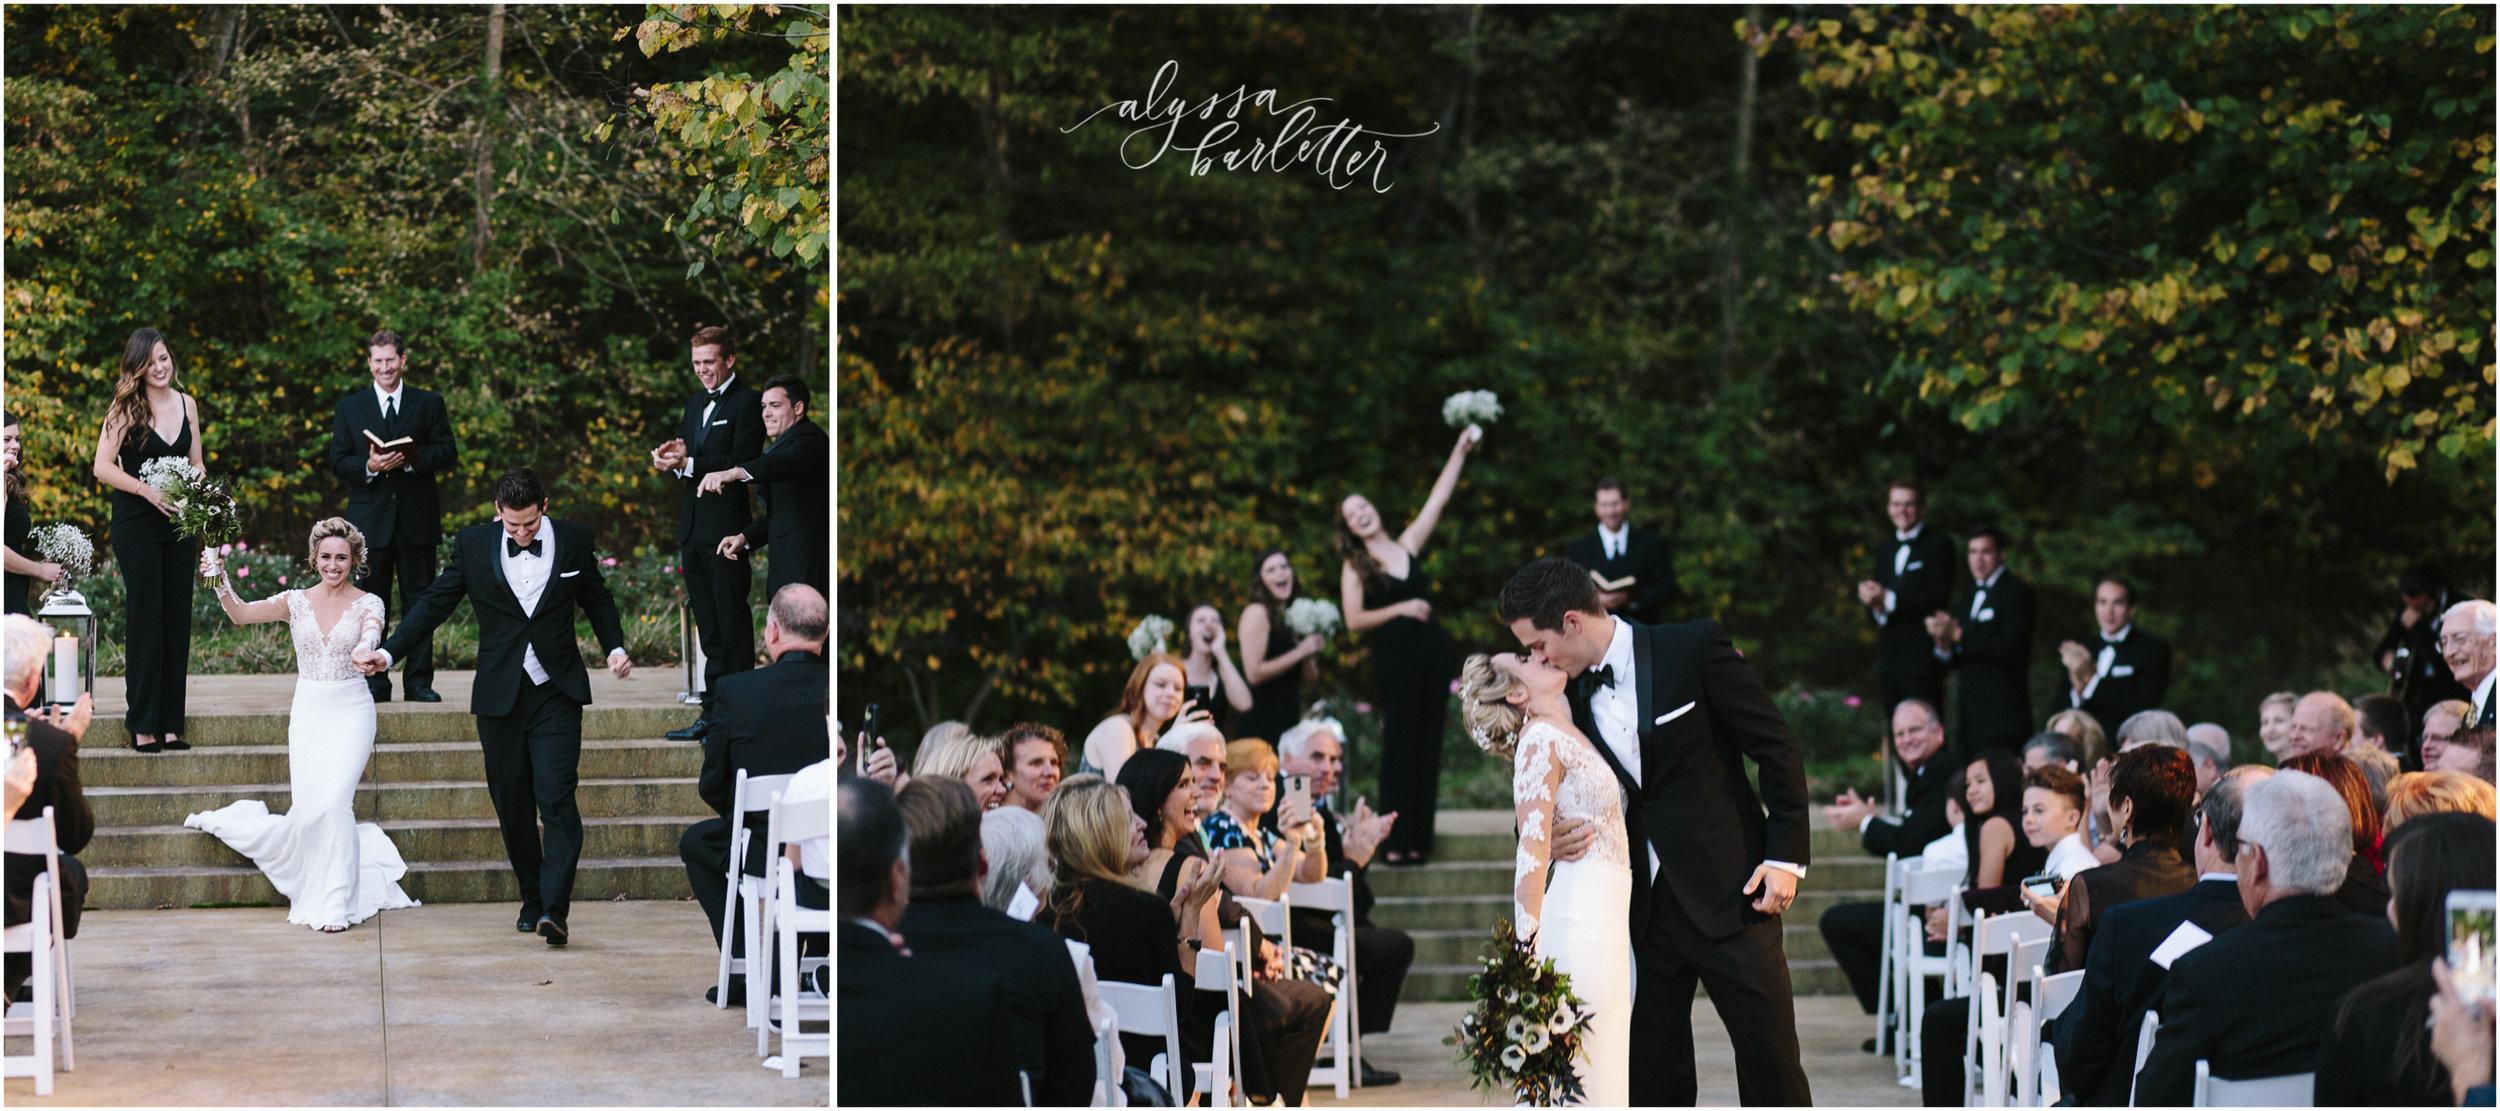 alyssa barletter photography fayetteville arkansas wedding photos micah and colin-1-48.jpg